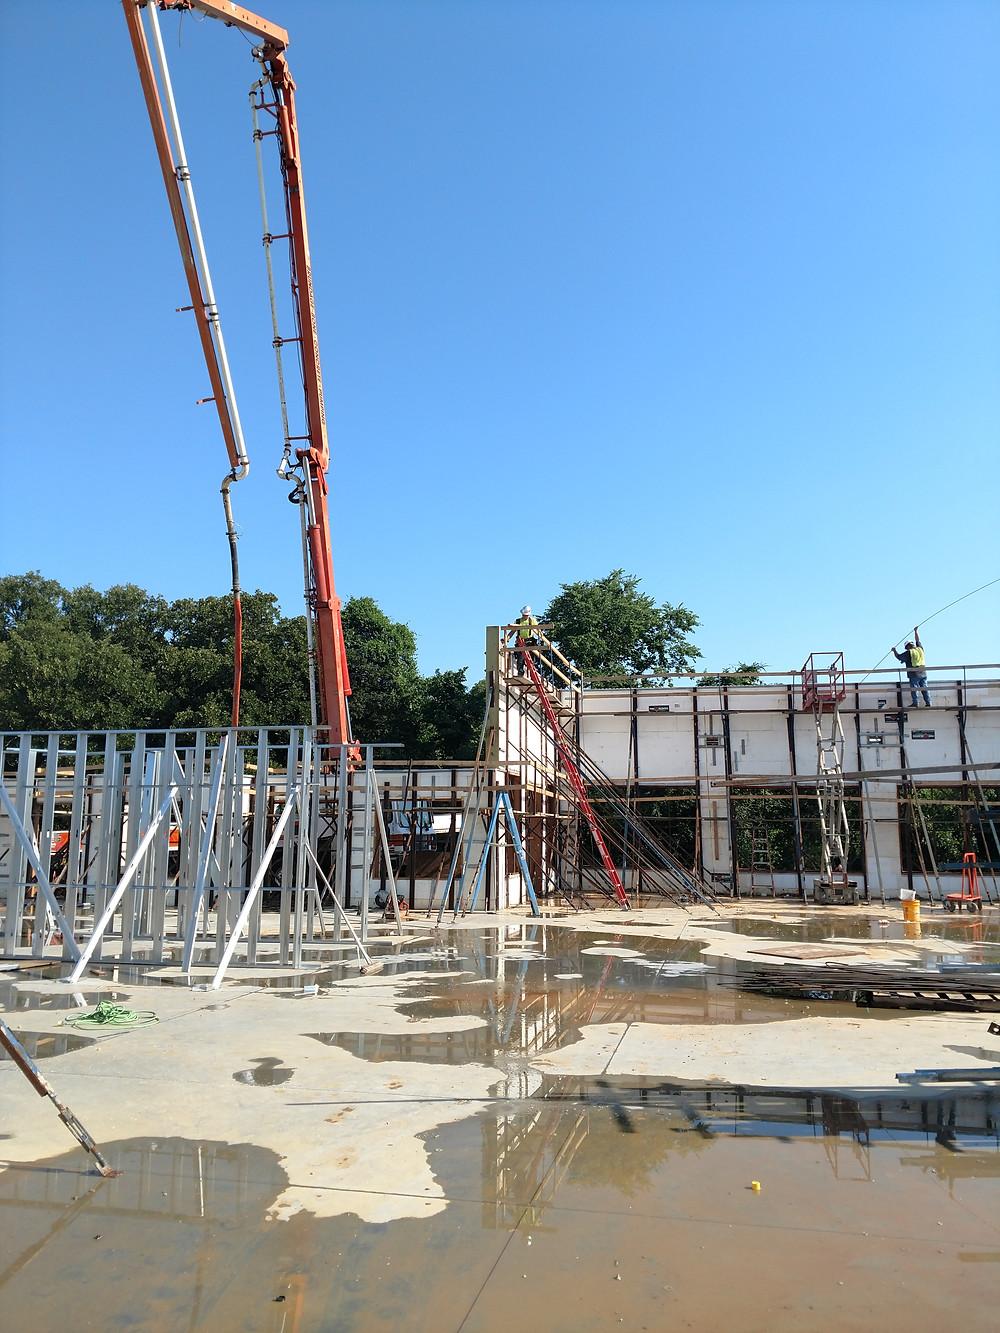 Panelized ICF wall panels 18' tall